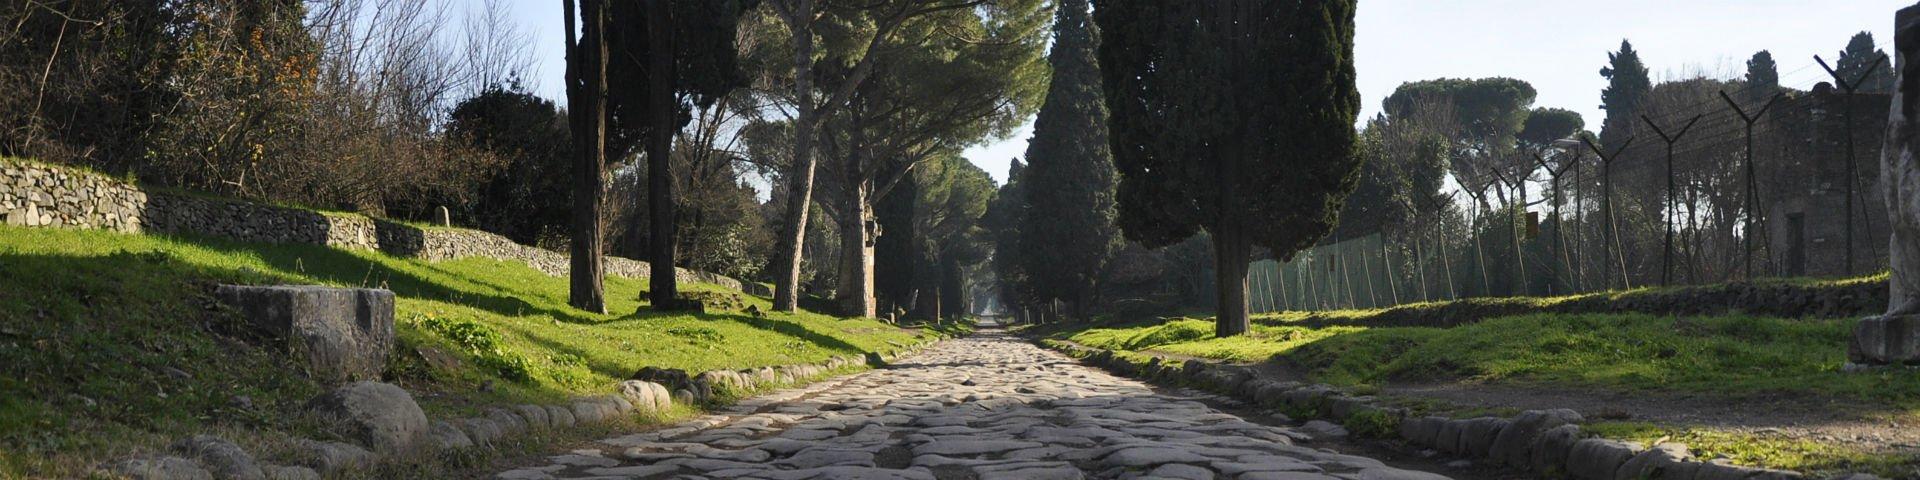 Appian Way Italy Tours